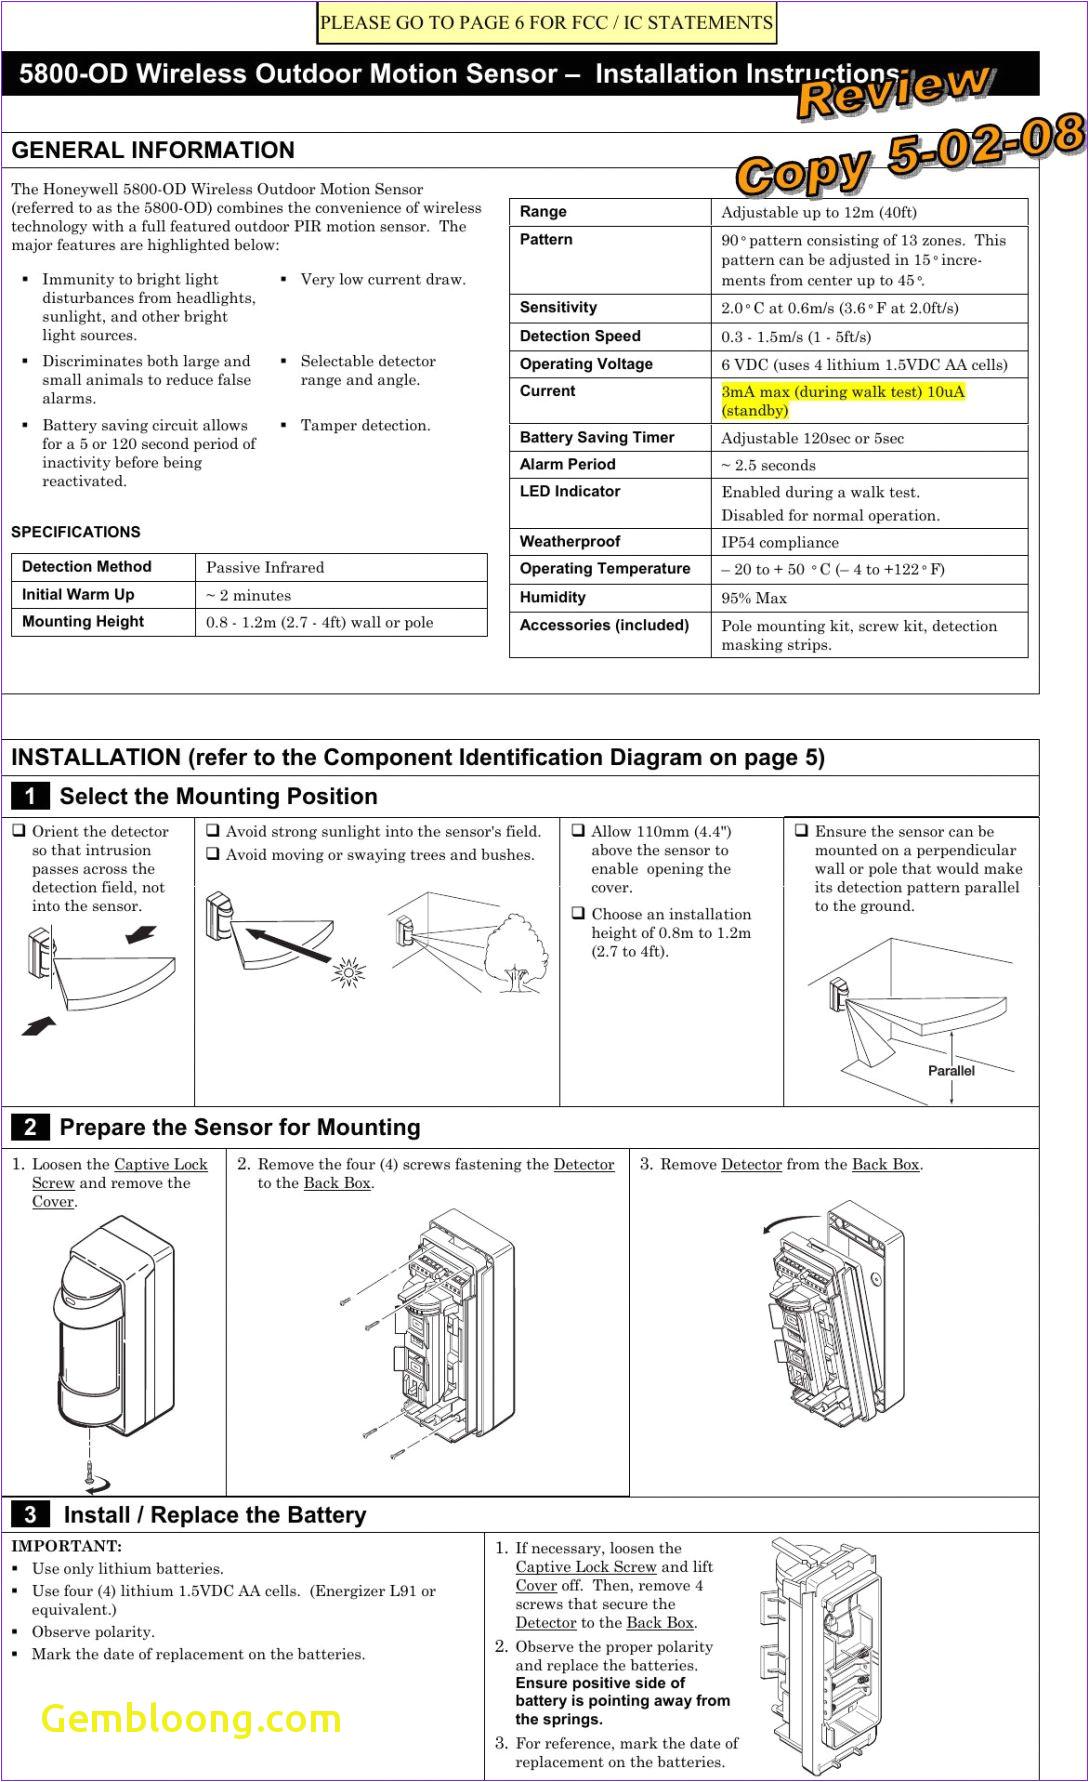 Occupancy Sensor Power Pack Wiring Diagram Wiring Diagram to Eliminate Battery Save Wiring Diagram Option